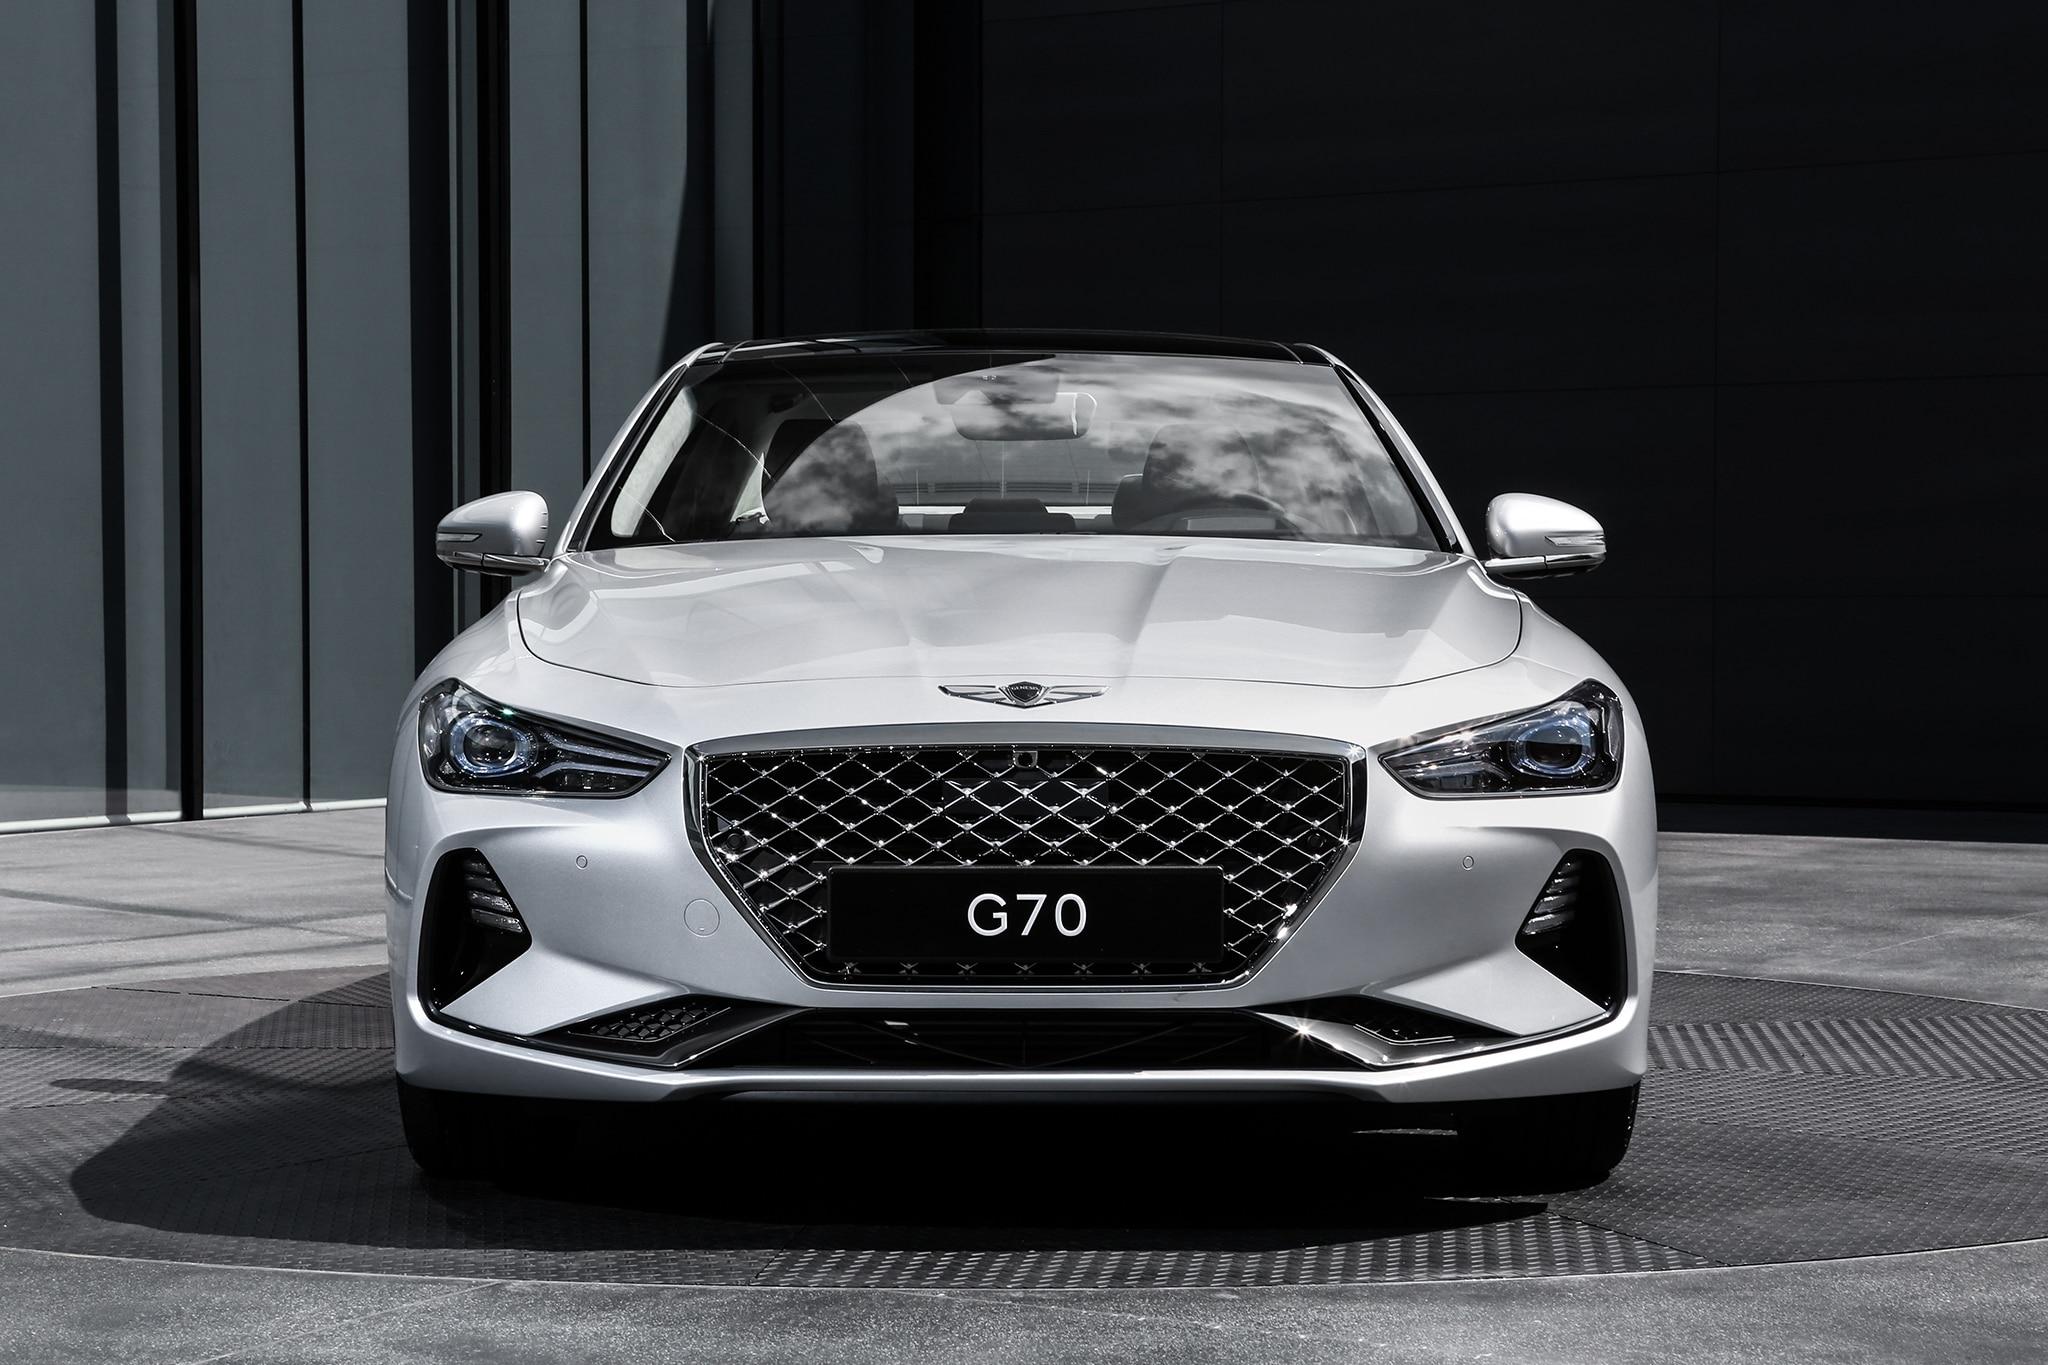 2019 Genesis G70 Front 2